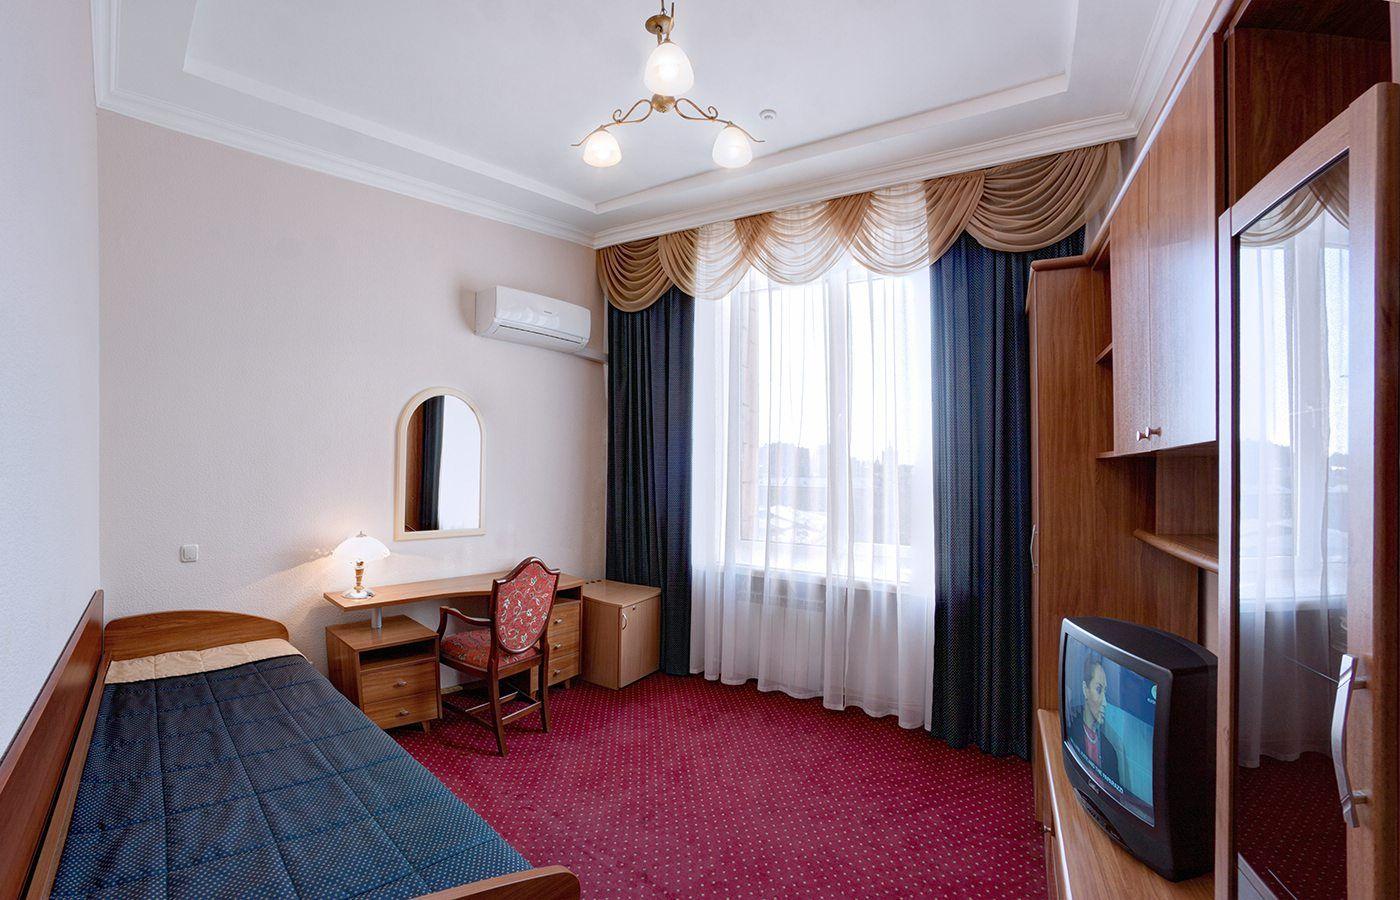 Hotel Ukraine in Kiev, Ukraine. Single Economy Room